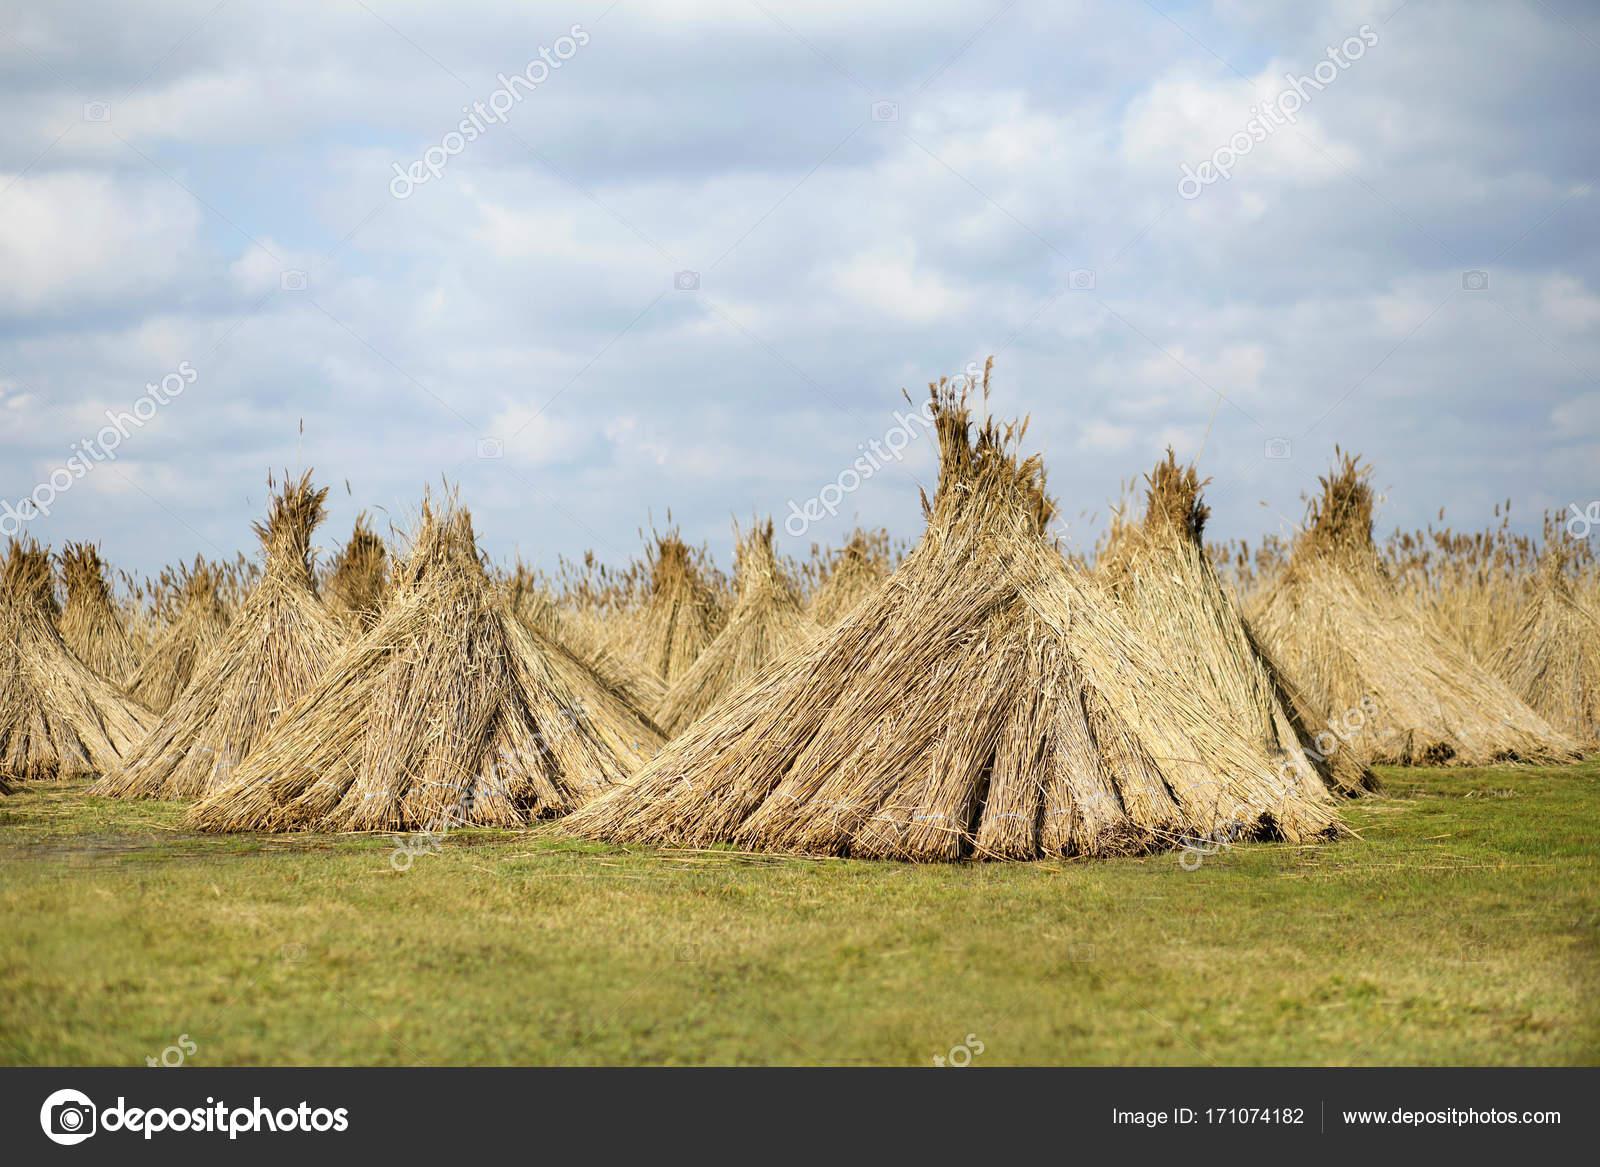 Reed Plant Gewas Stockfoto Marenka1 171074182